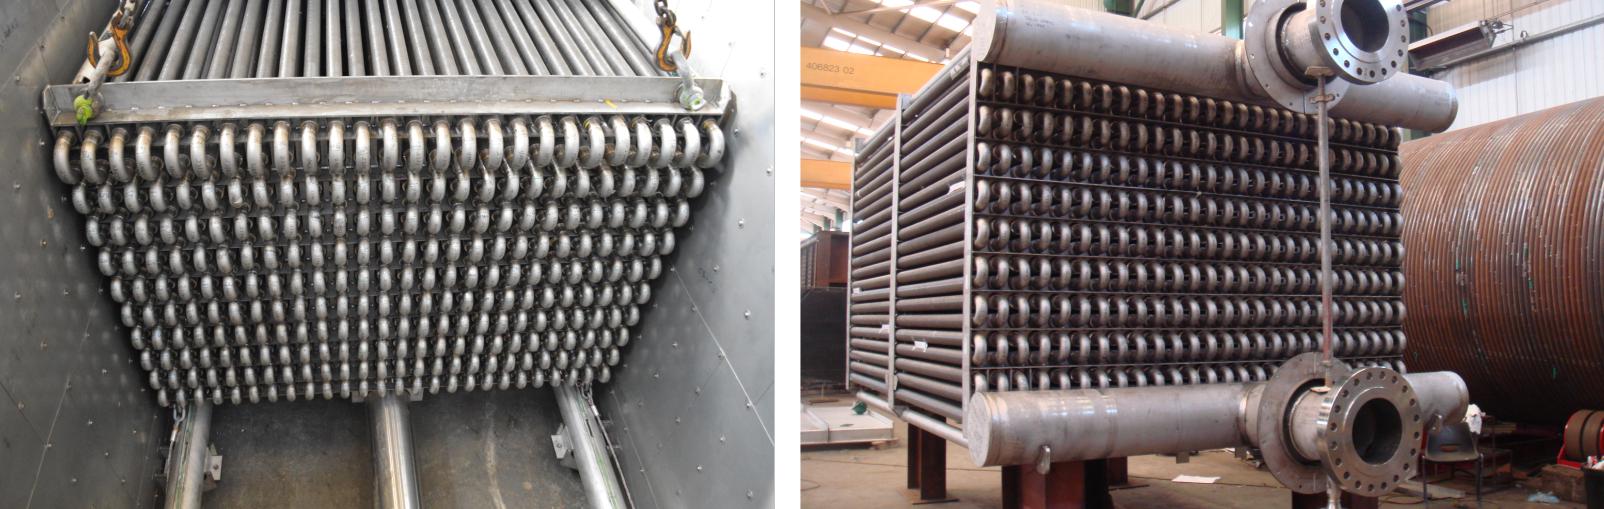 Waste Heat Recovery Units (WHRU)